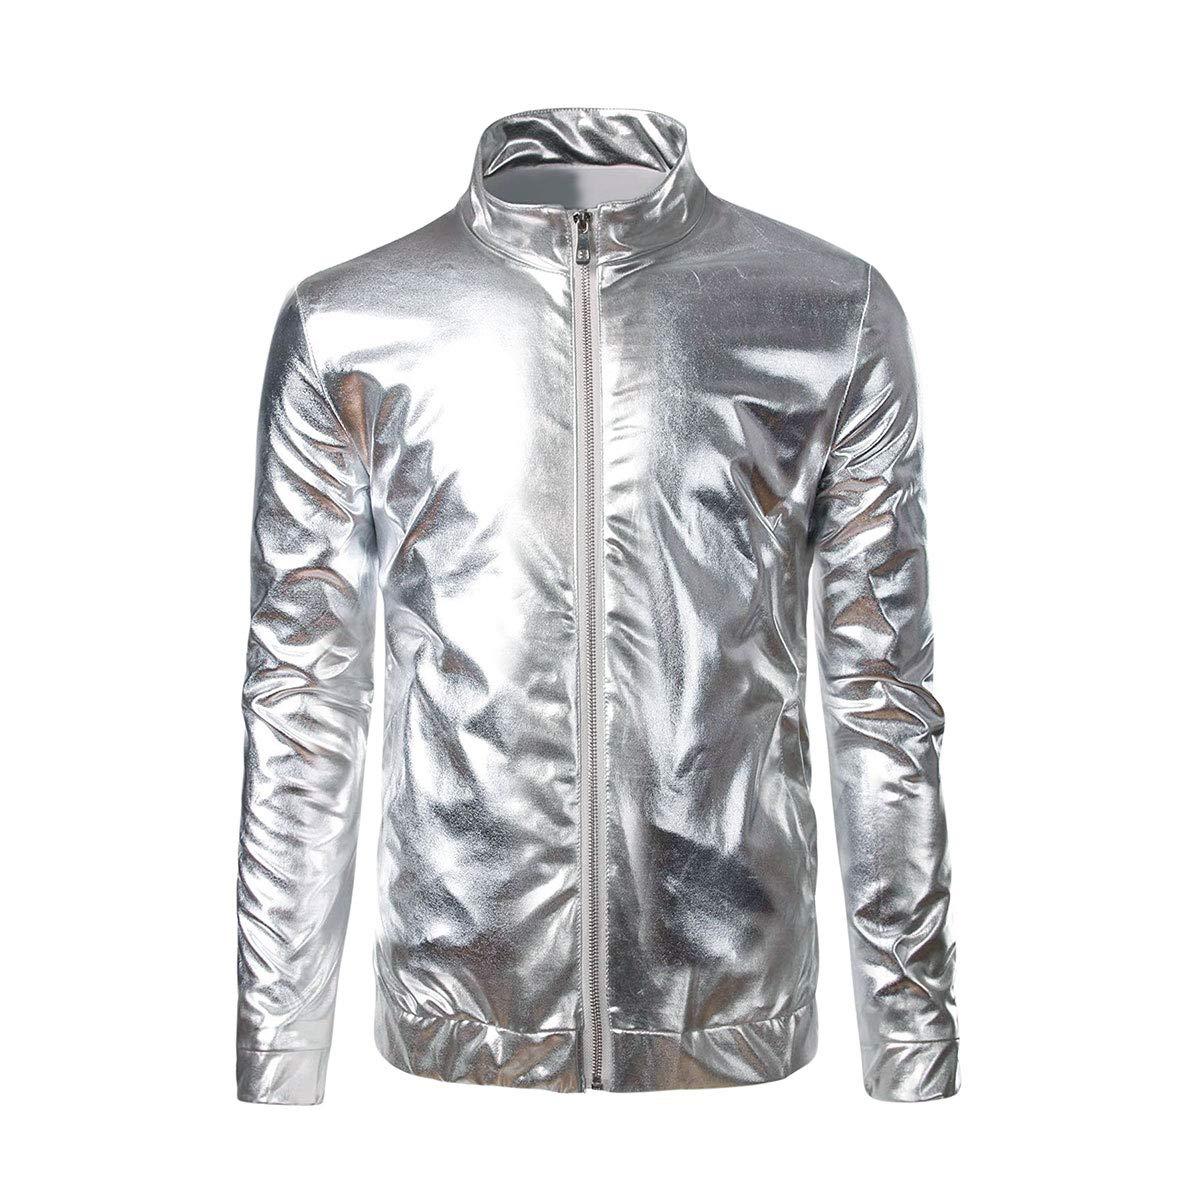 Keepline Mens Gold Zipper Jacket Hooded Metallic Hip Hop Nightclub Dancing Party Jackets